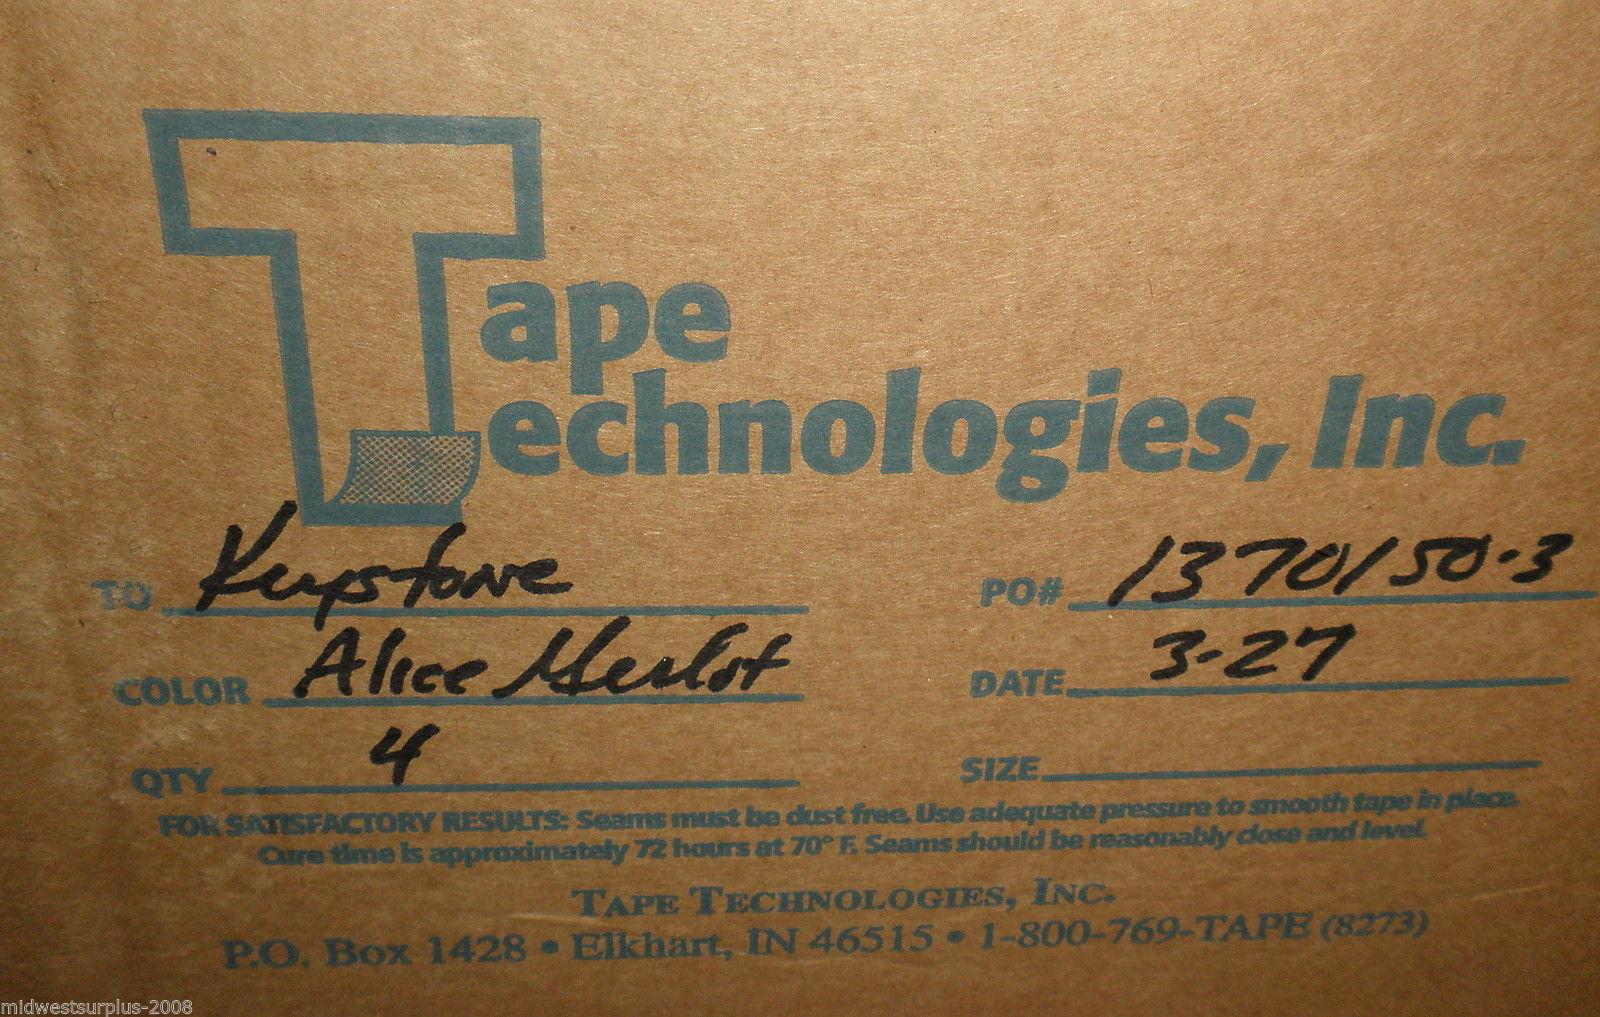 "Tape Technologies / Keystone Alice Merlot 6"" Self Adhesive Wallpaper Border"